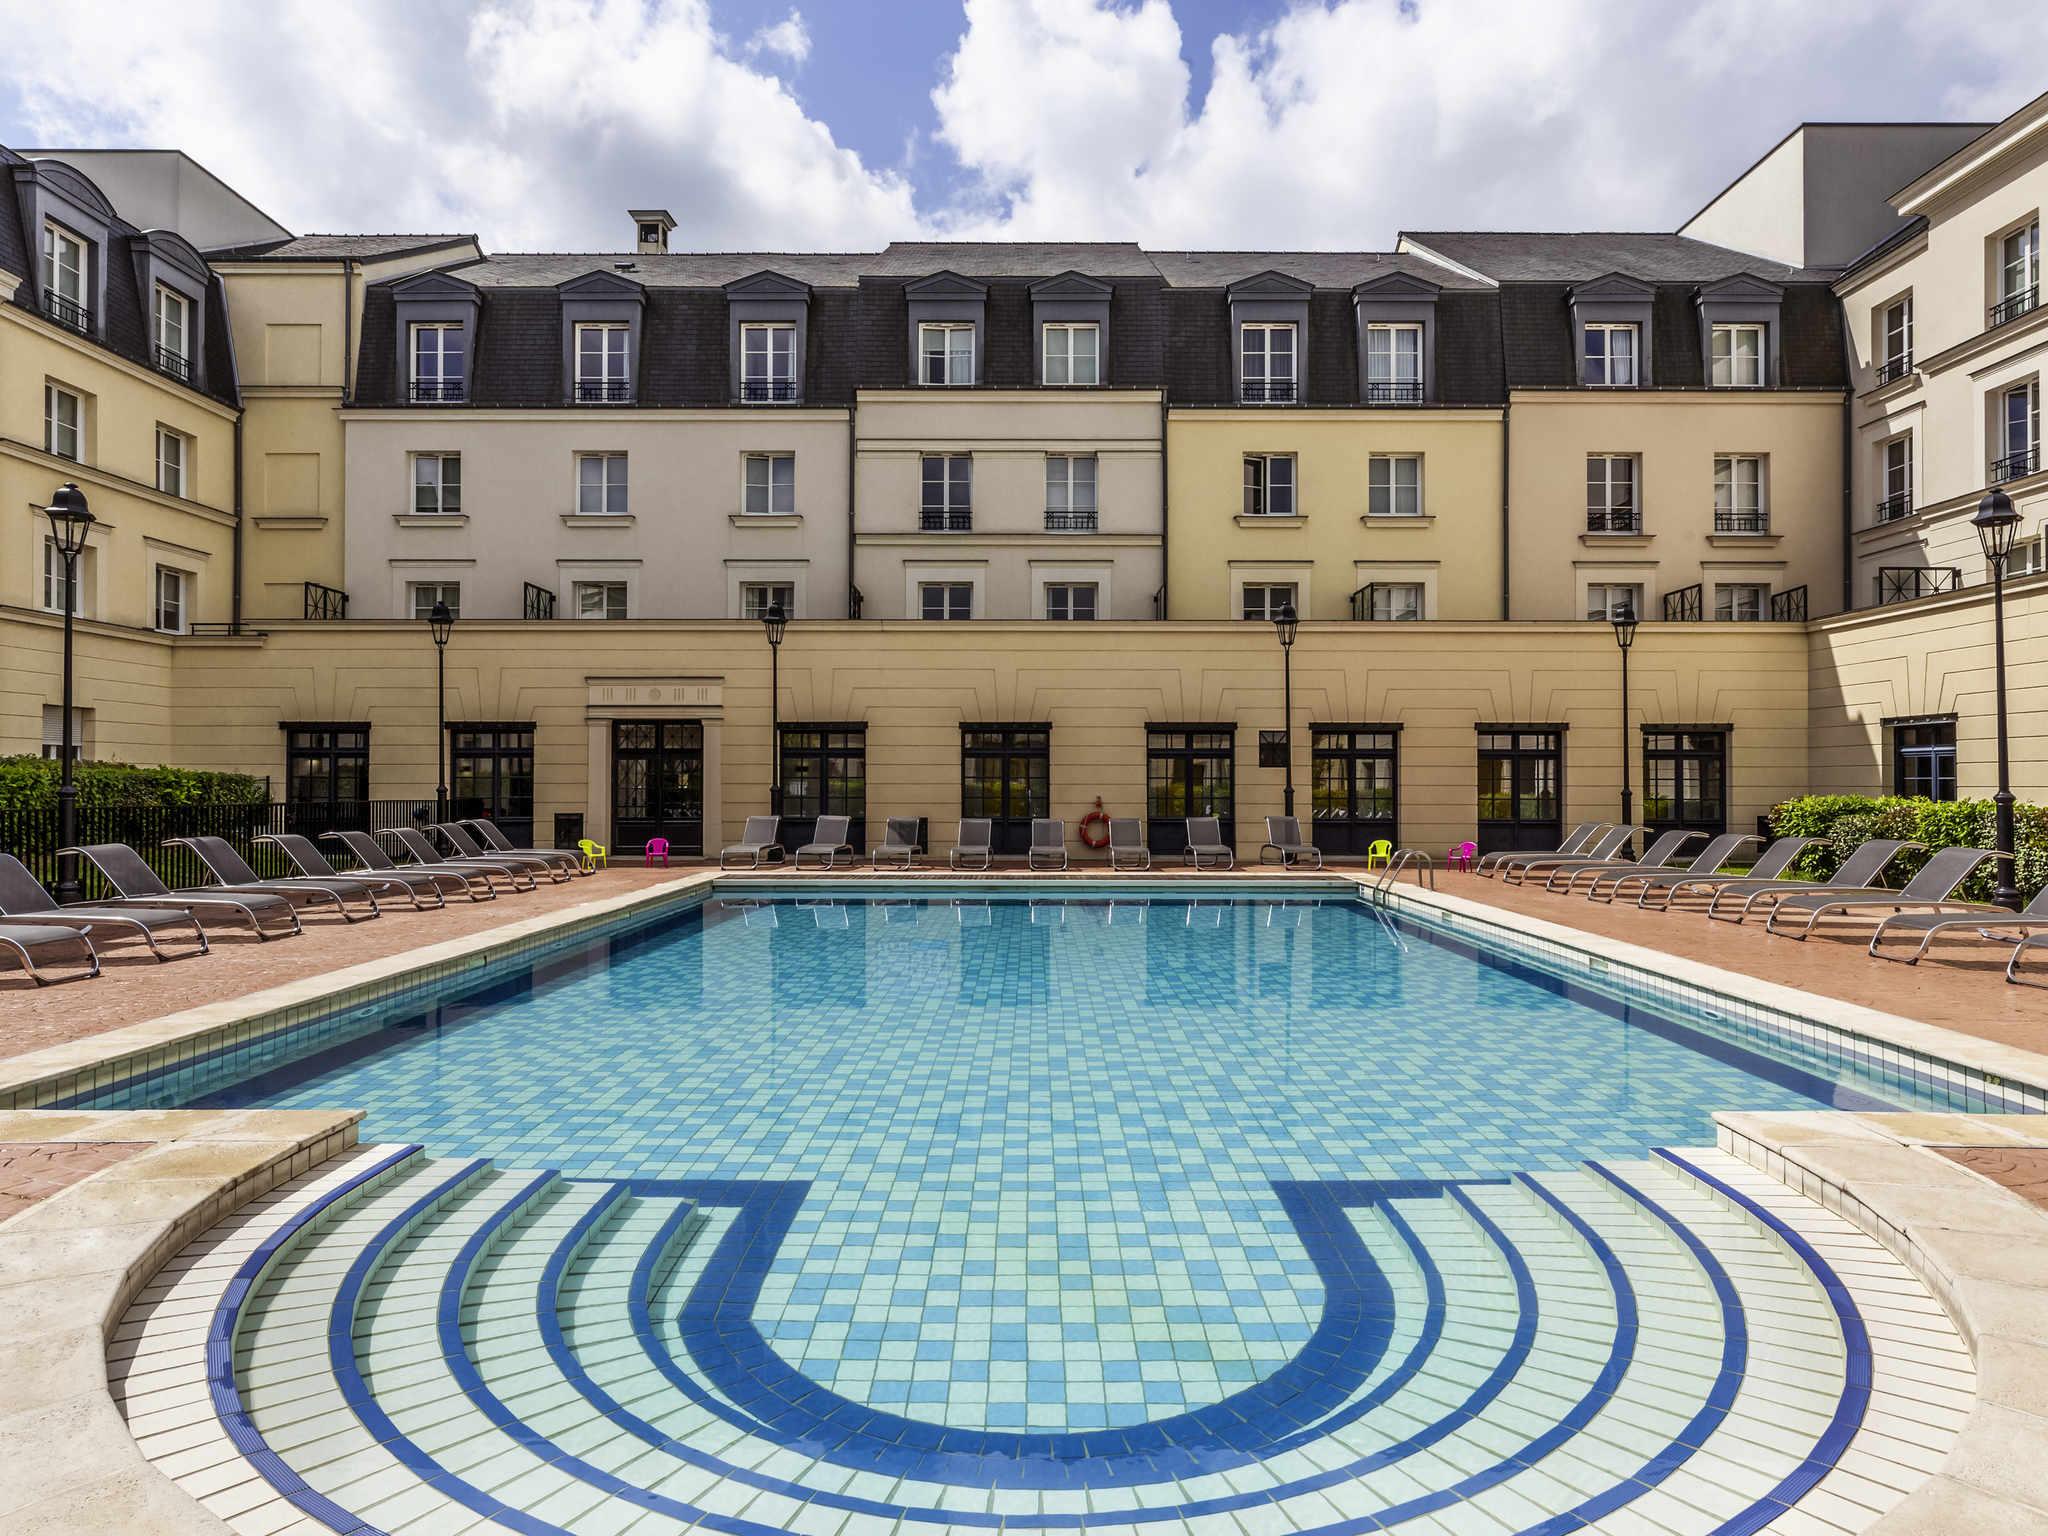 فندق - Hipark by Adagio Serris - Val d'Europe